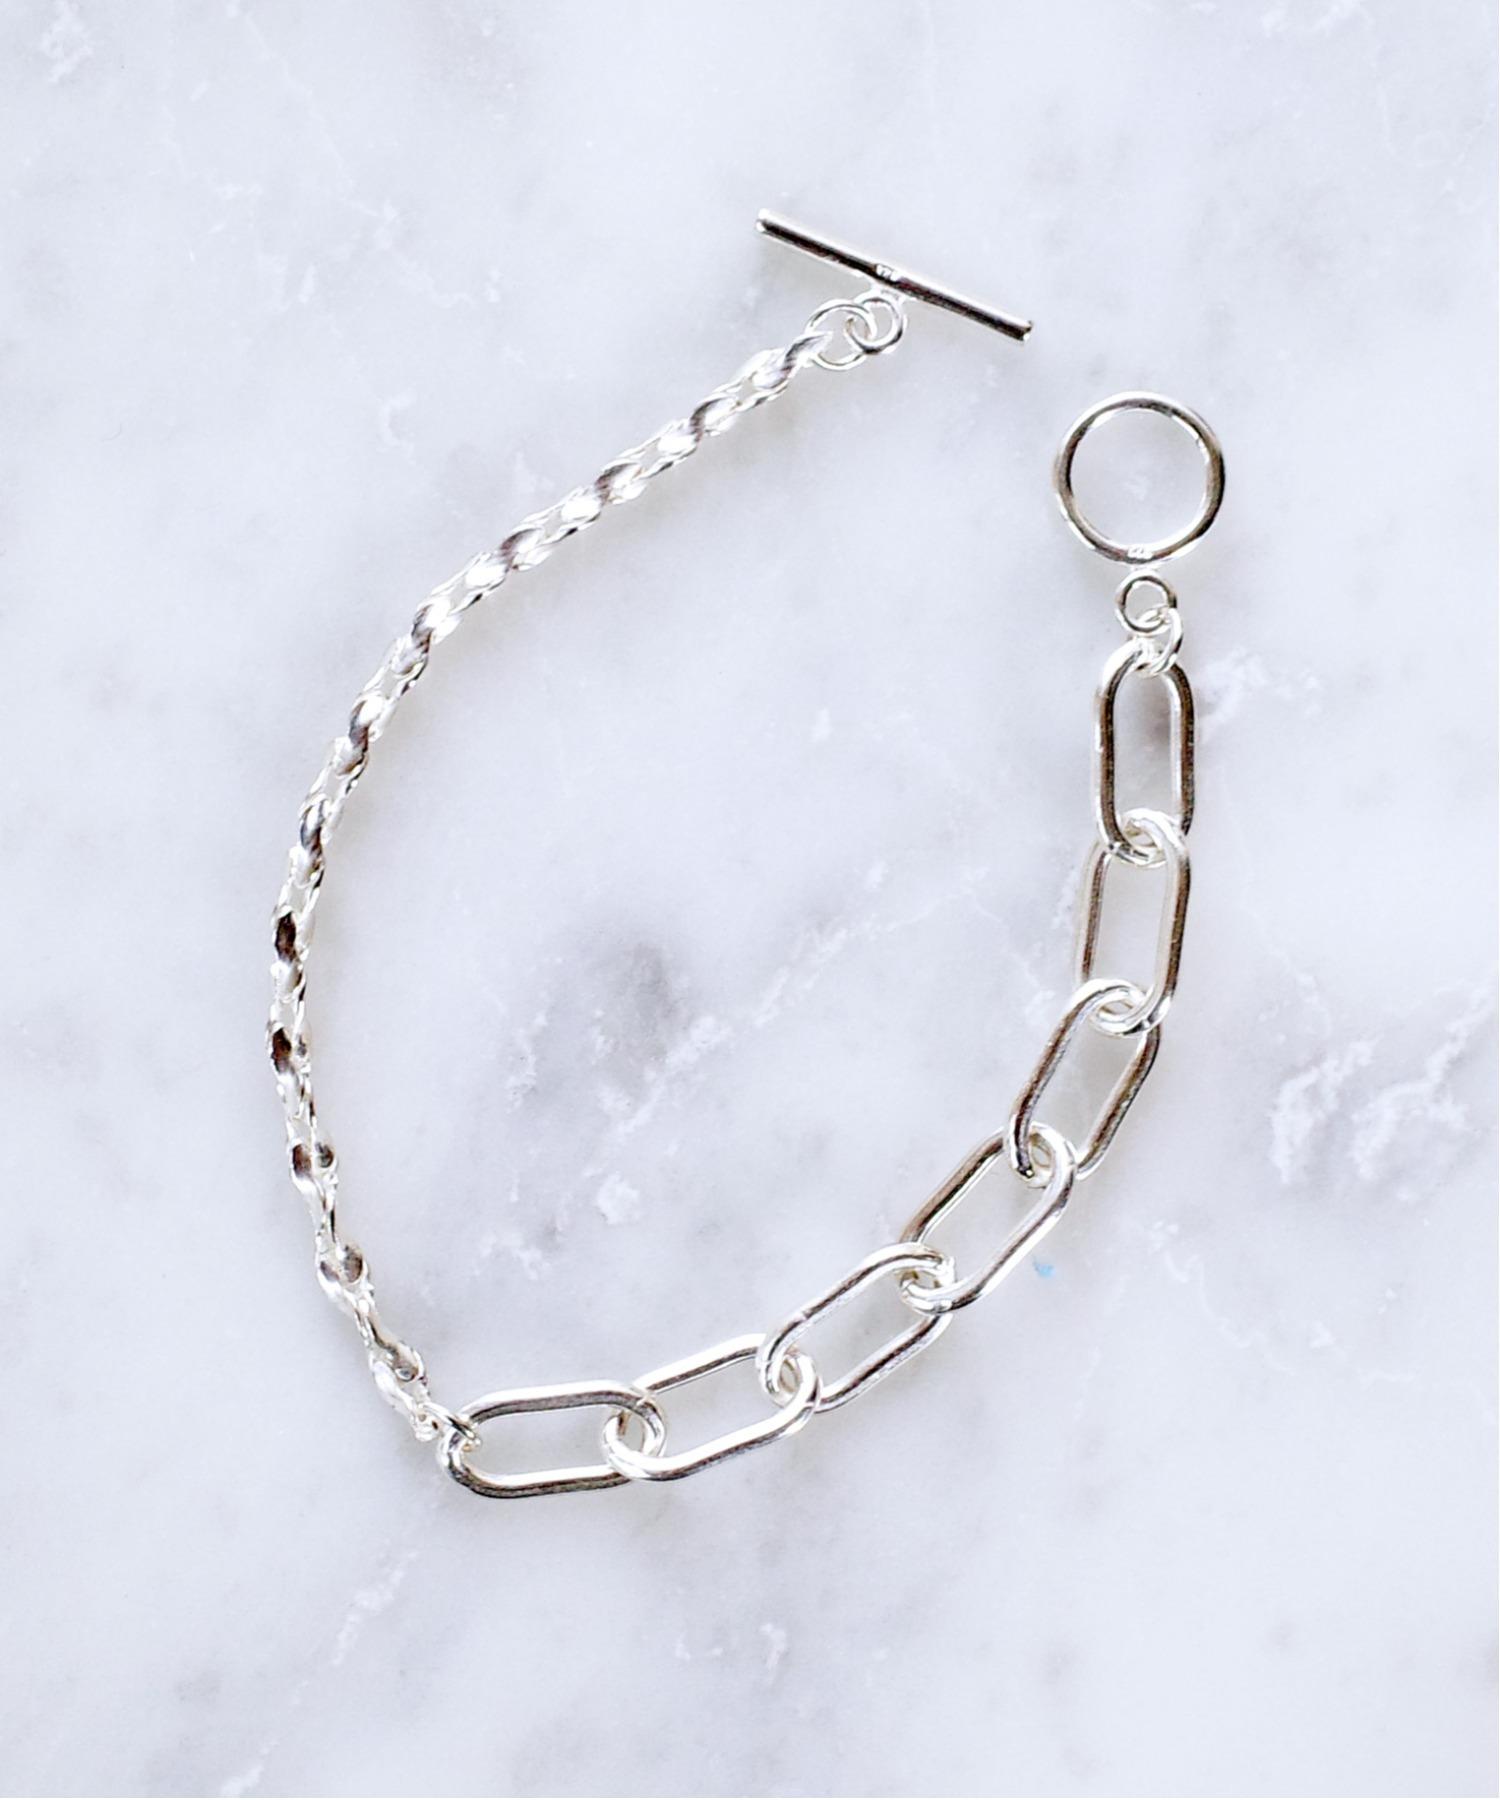 【ISOLATION / アイソレーション】SV925 Twist Mix Chain Bracelet